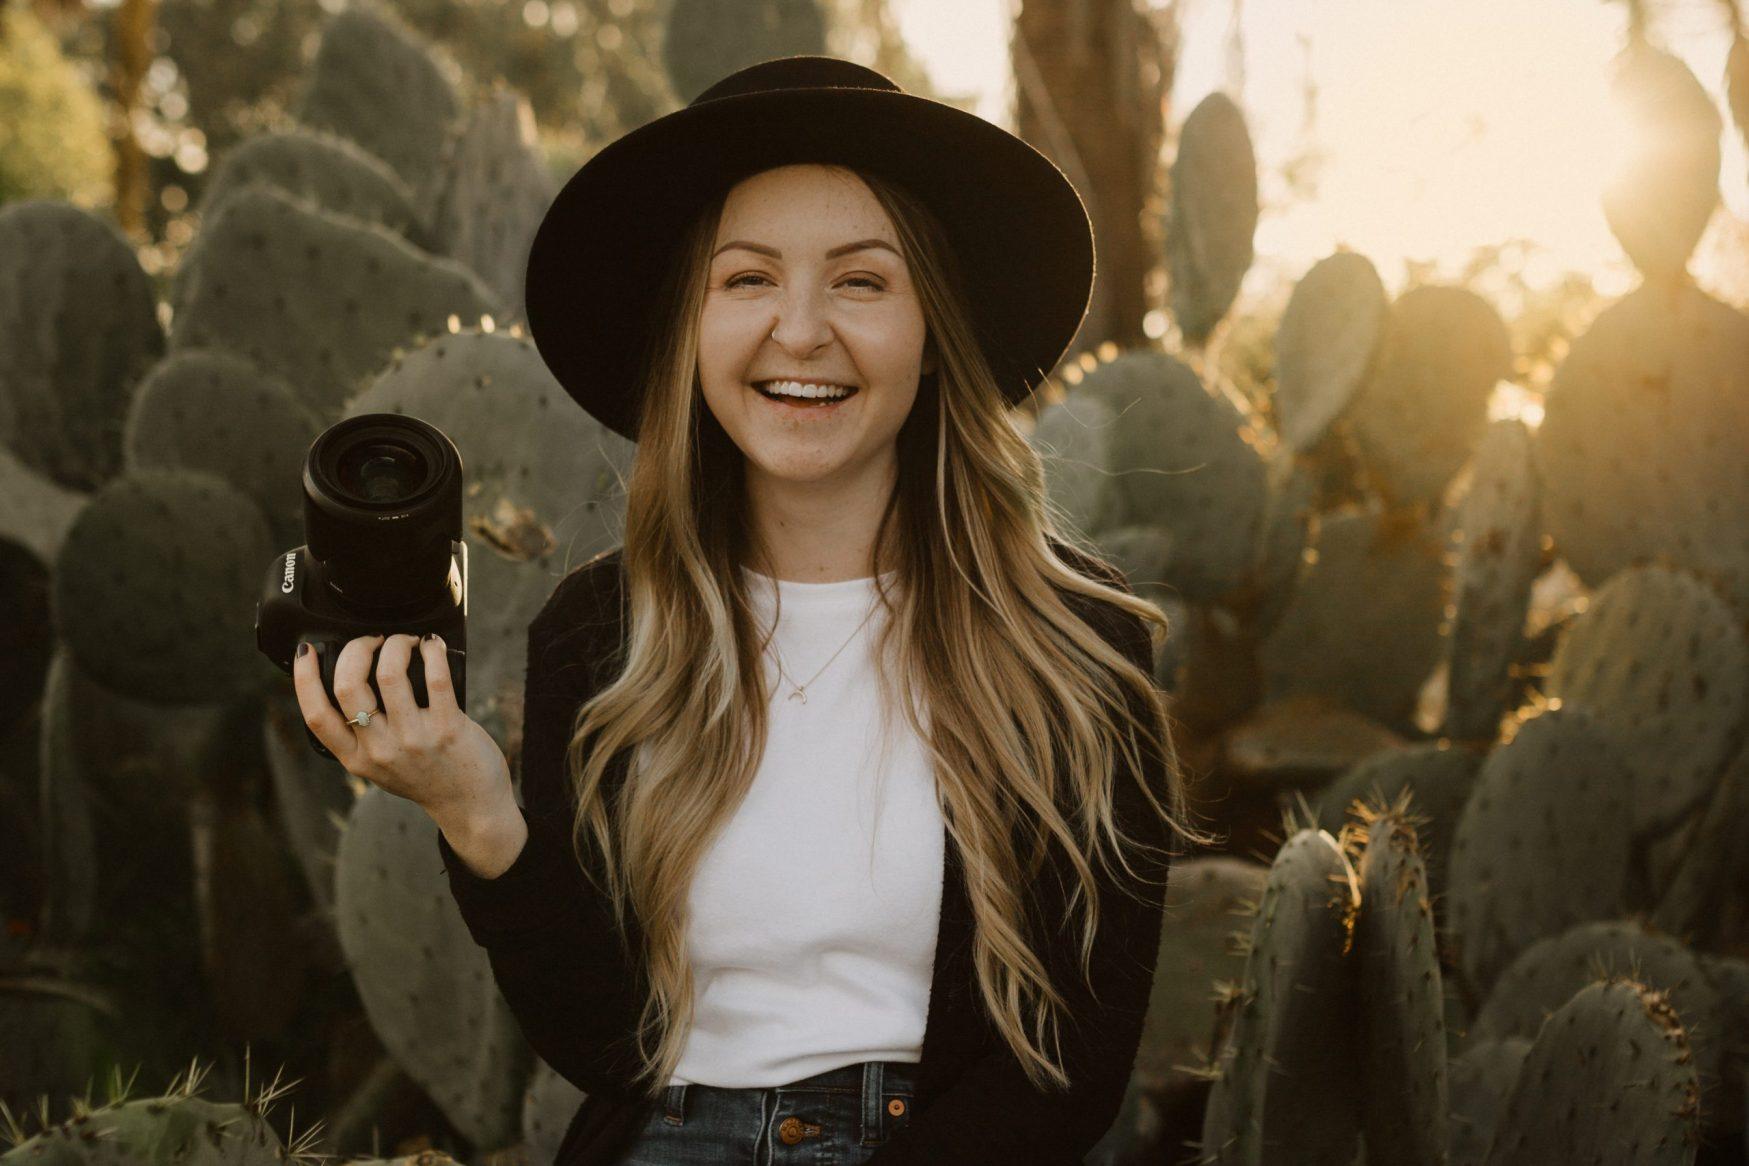 Samantha Phillips Photography a San Diego Wedding Photographer